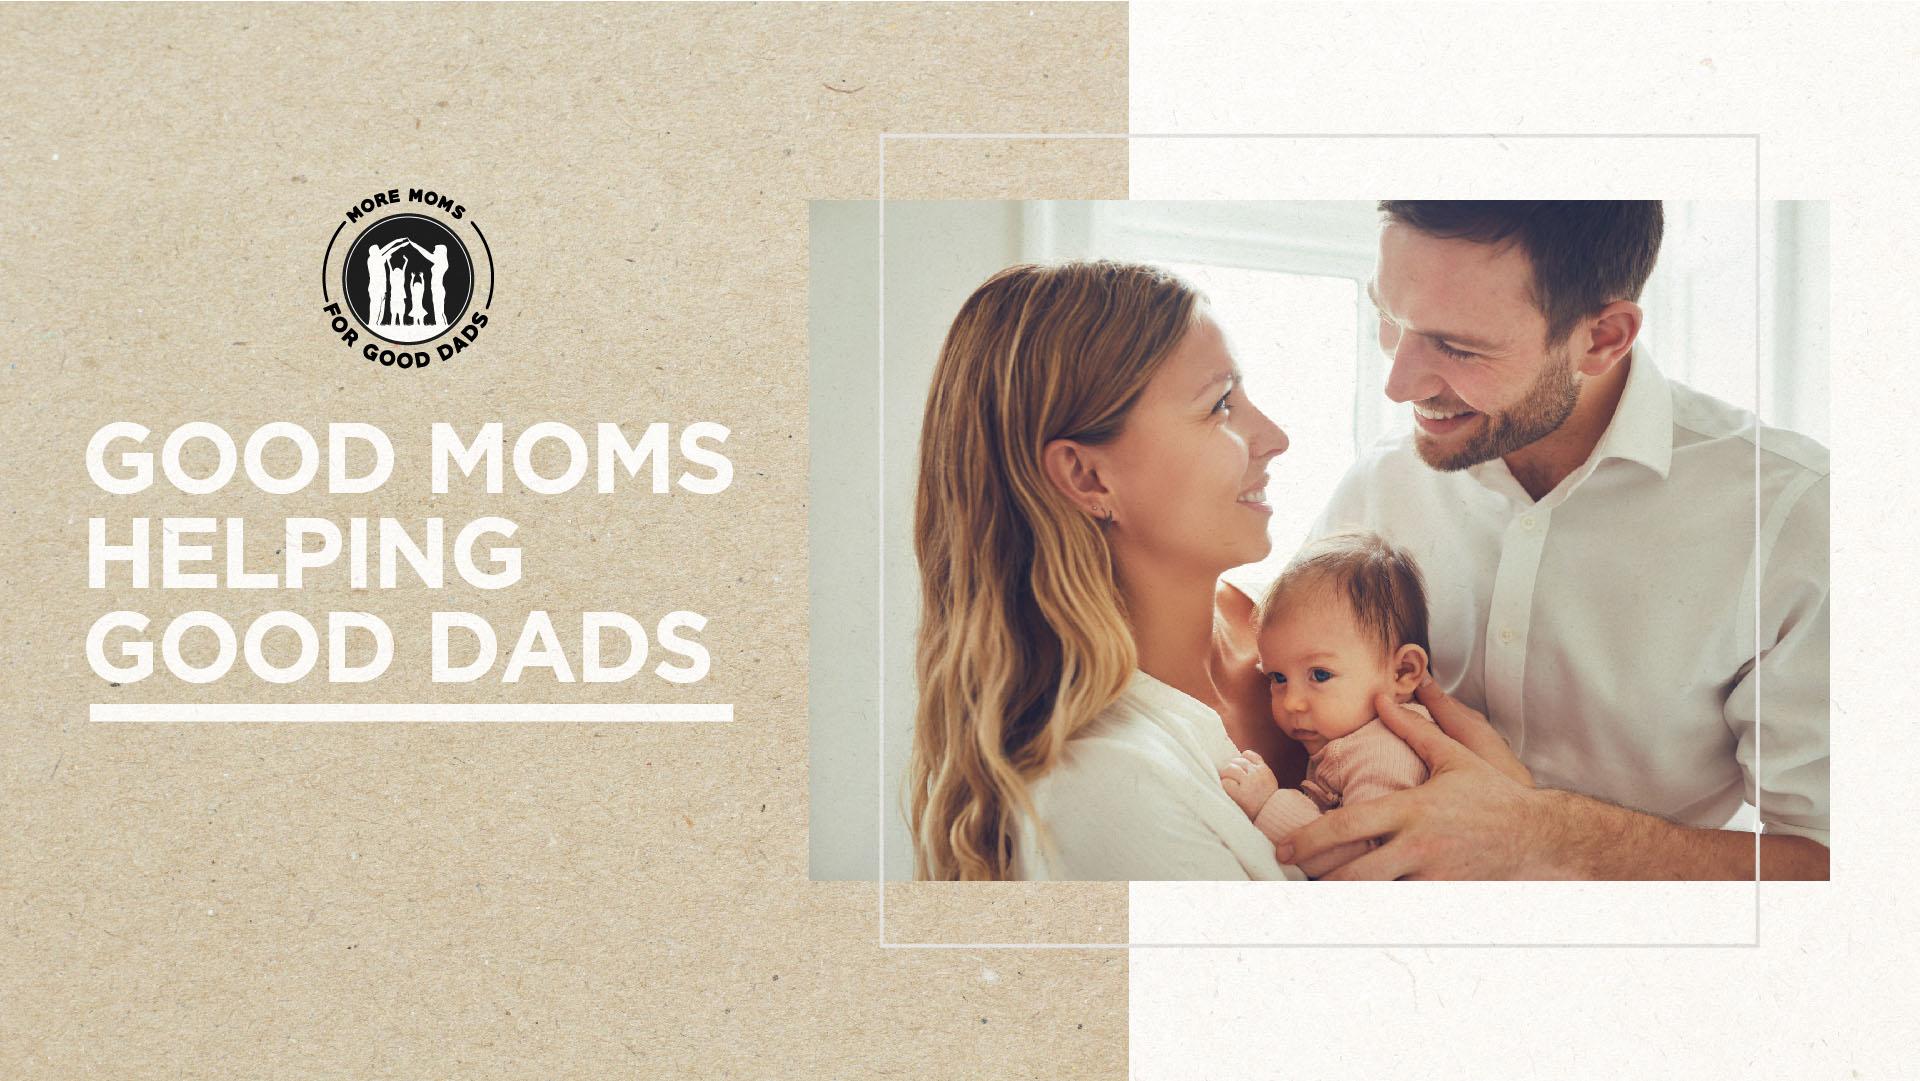 GOOD MOMS HELPING GOOD DADS